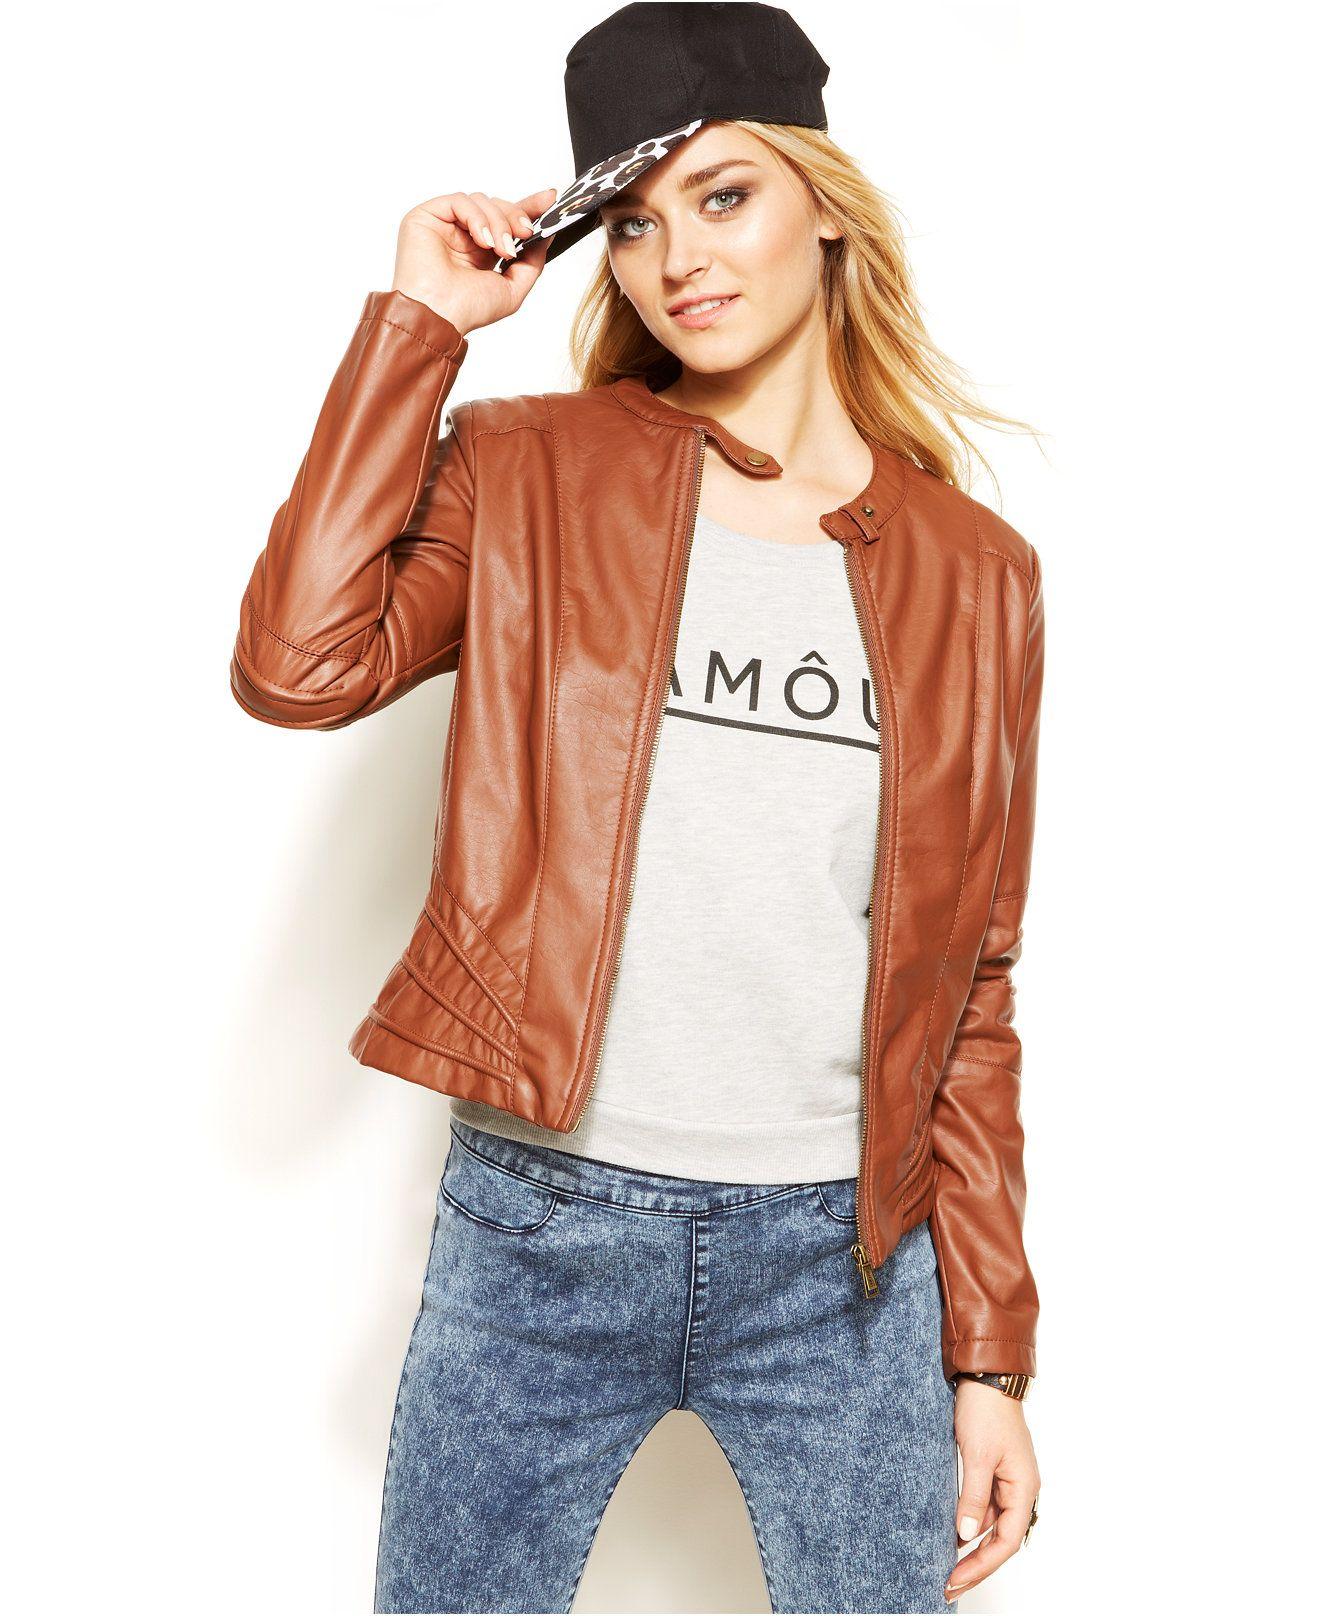 Jou Jou FauxLeather Moto Jacket Leather jackets women